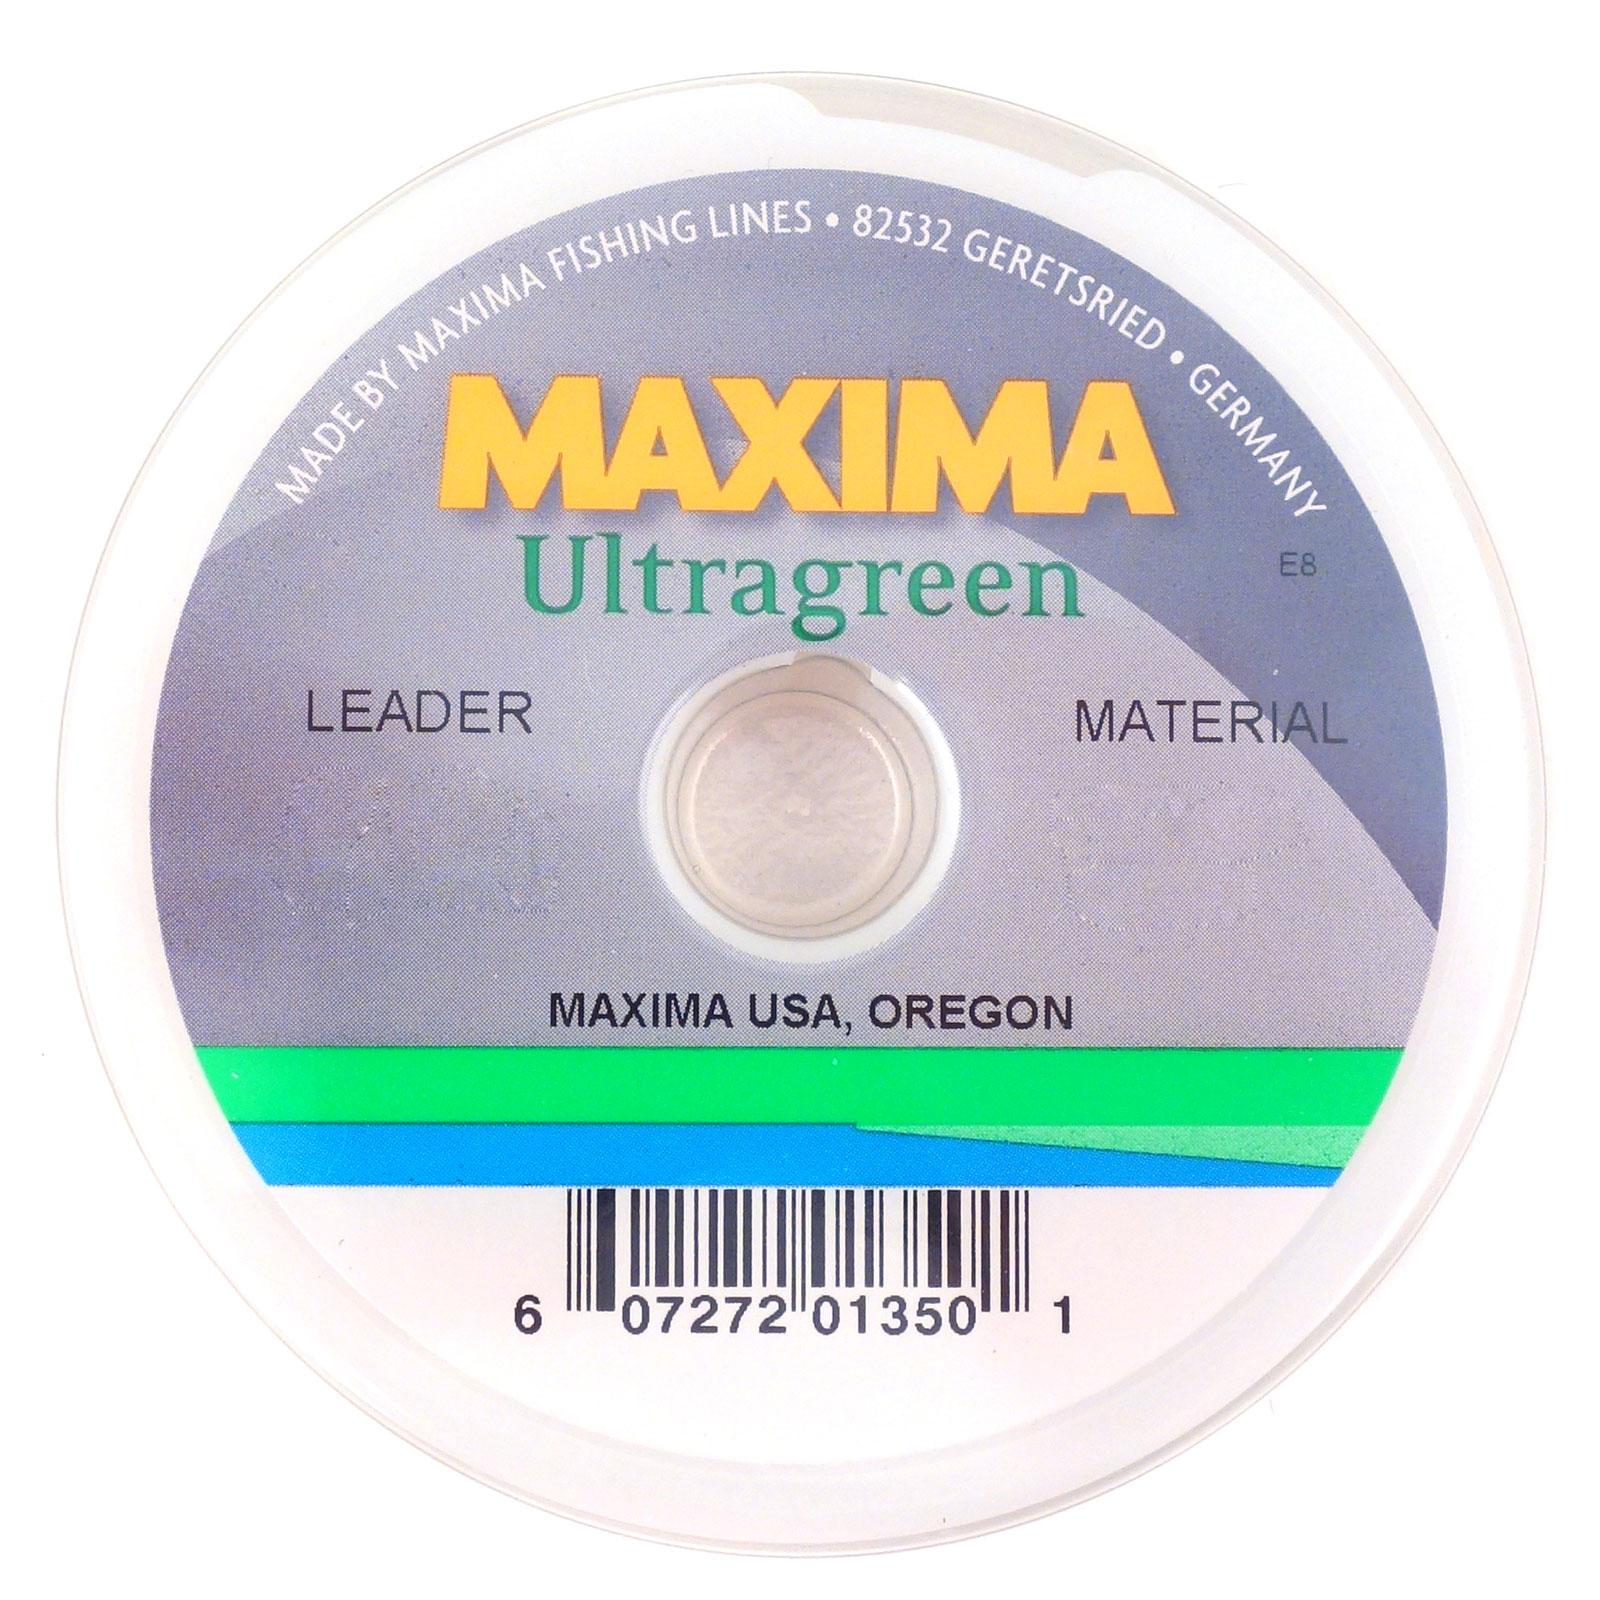 NEW MAXIMA ULTRAGREEN LEADER MATERIAL 20LB 27YD SPOOL fly fishing durable